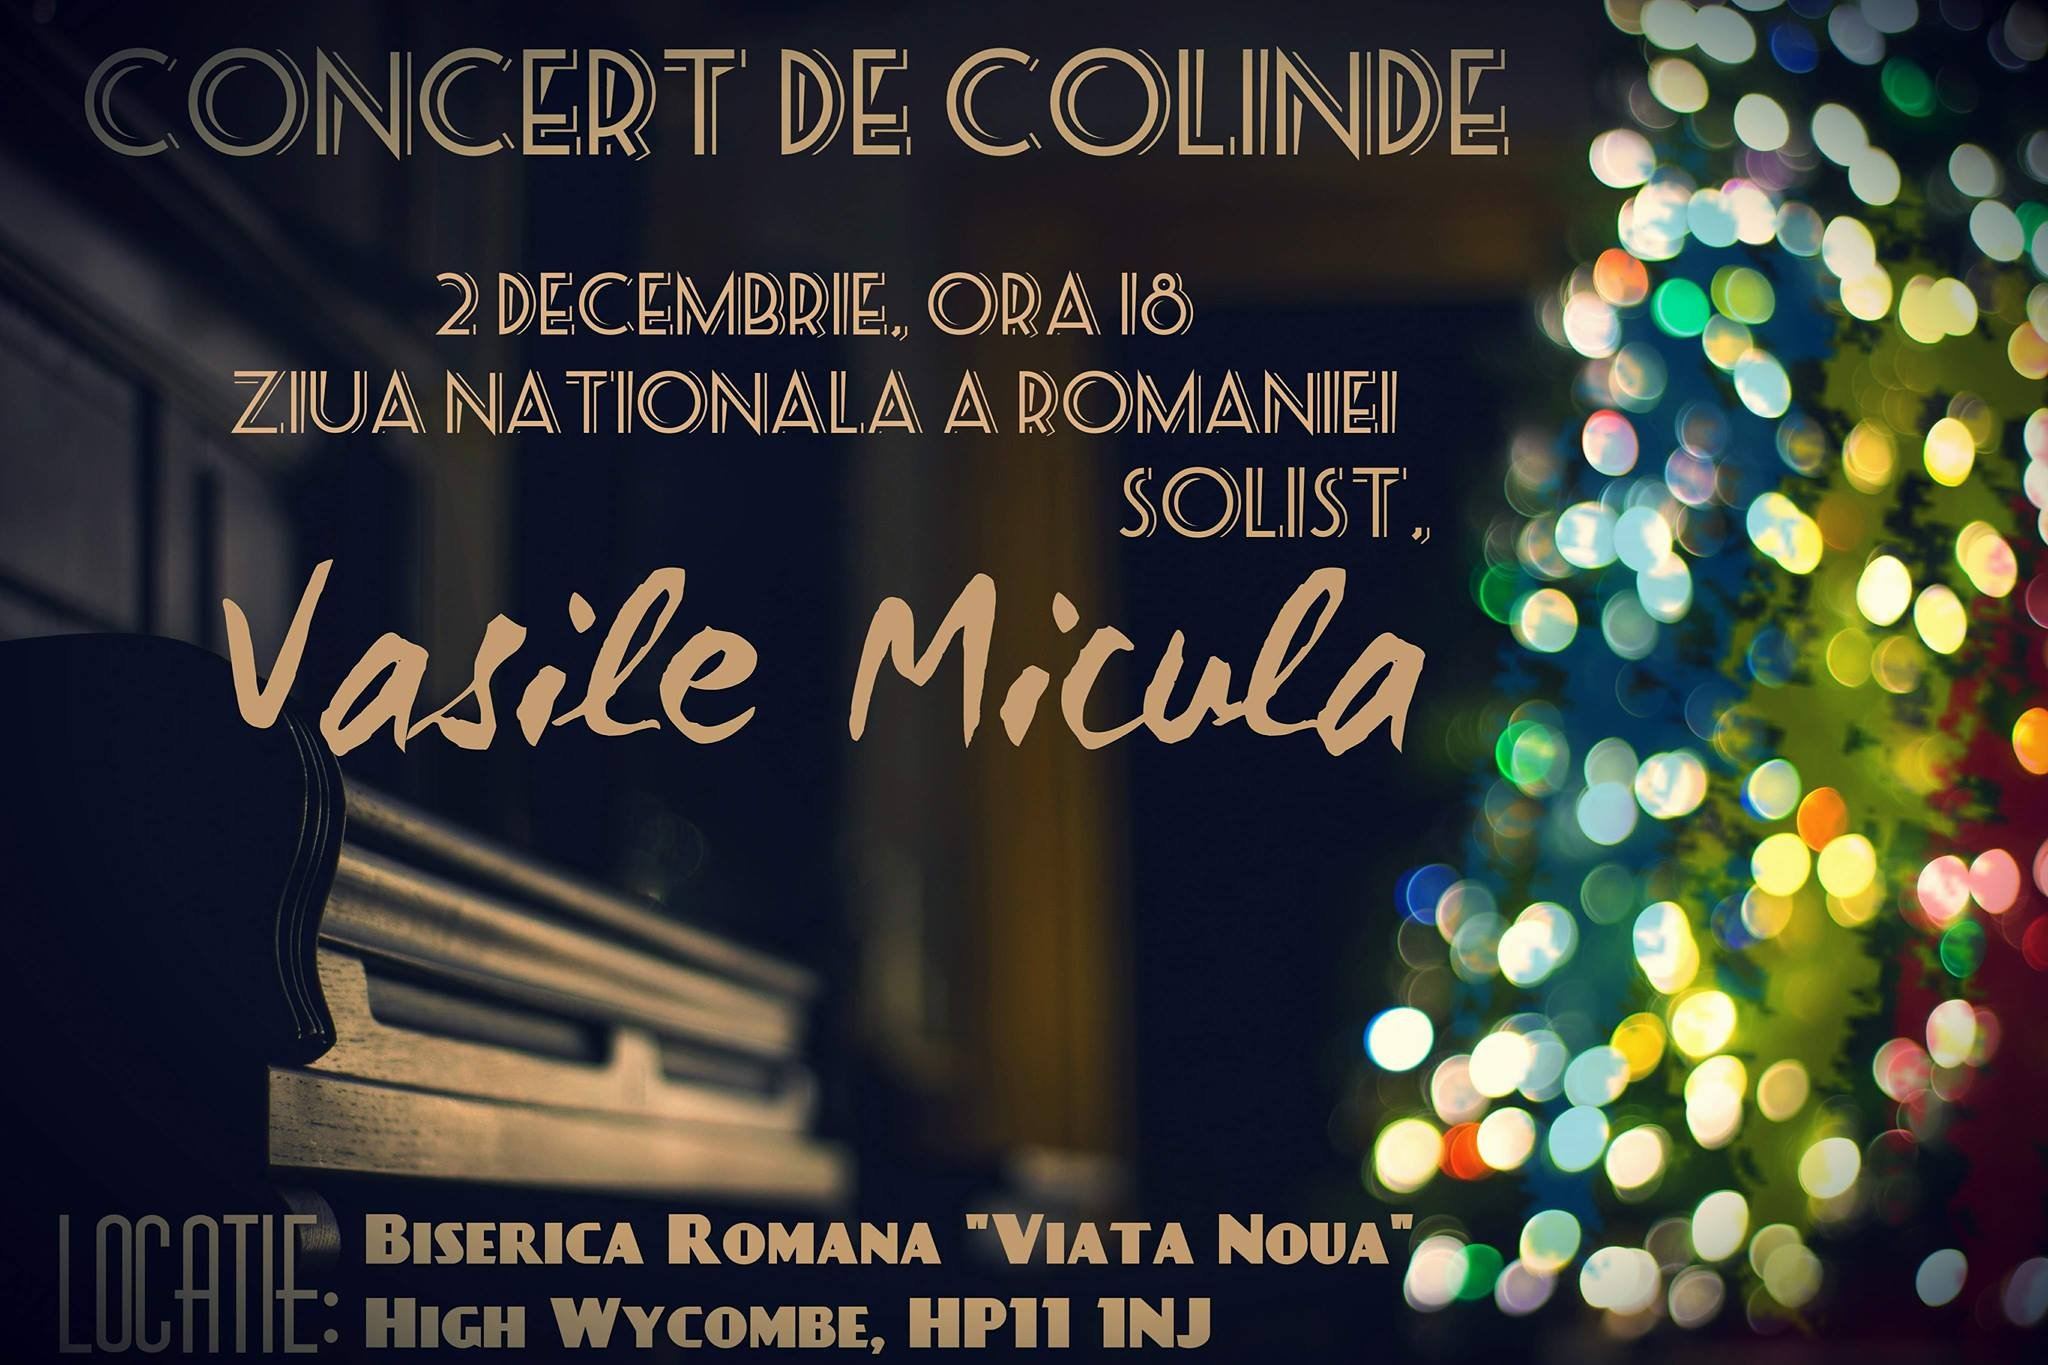 Concert de Colinde cu Vasile Micula – High Wycombe